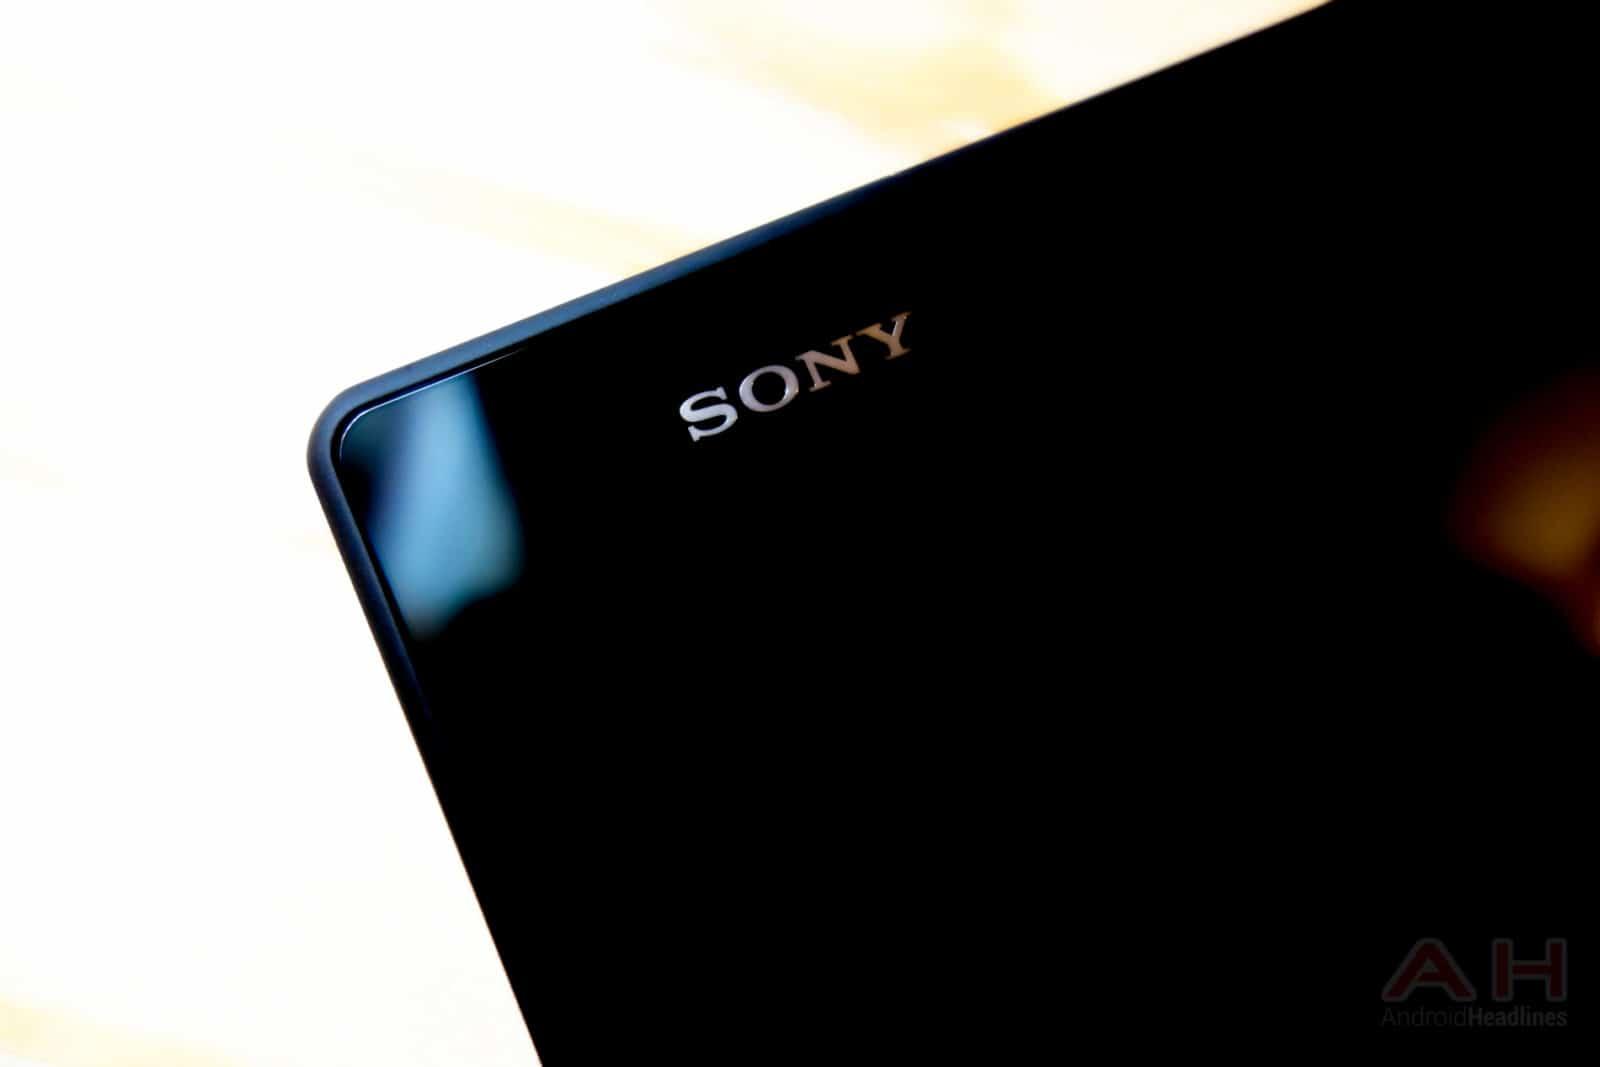 Sony-Xperia-Z2-Tablet-AH-1